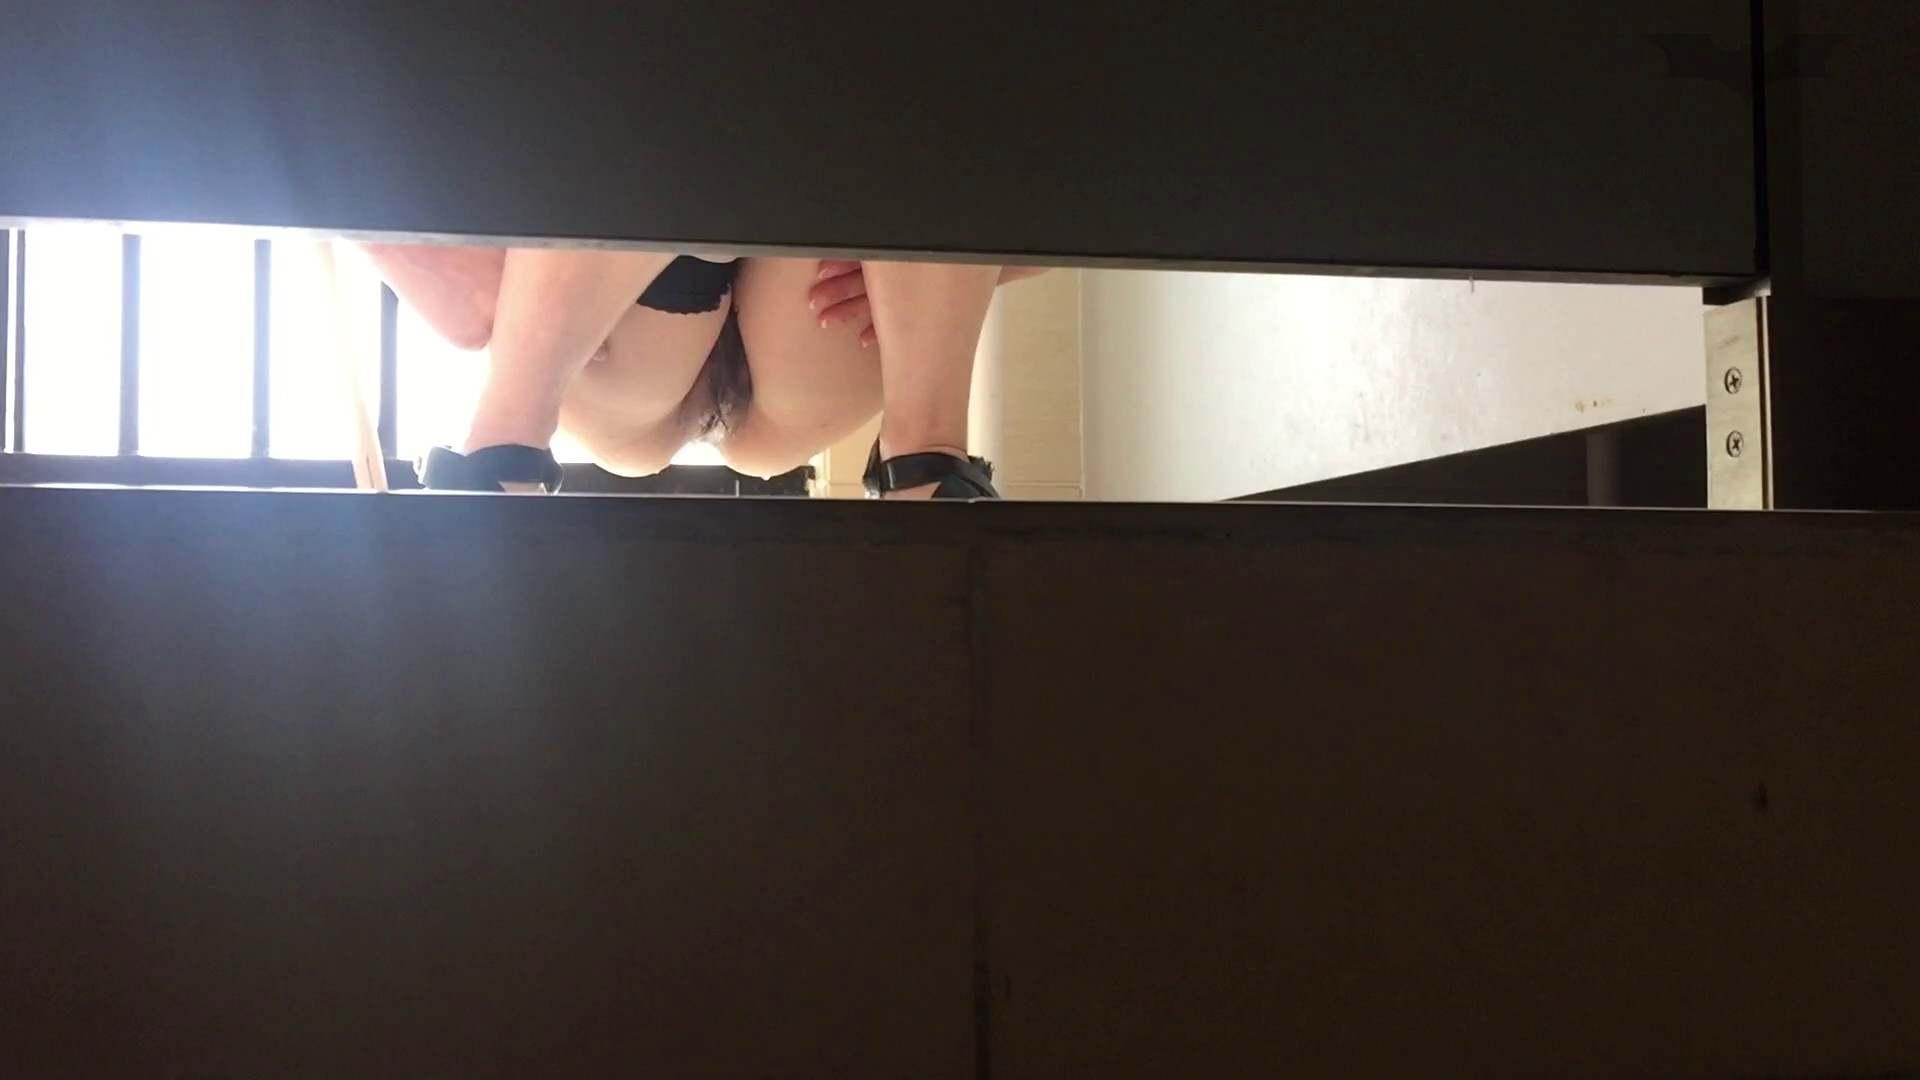 JD盗撮 美女の洗面所の秘密 Vol.73 盗撮映像大放出 おめこ無修正画像 67連発 33